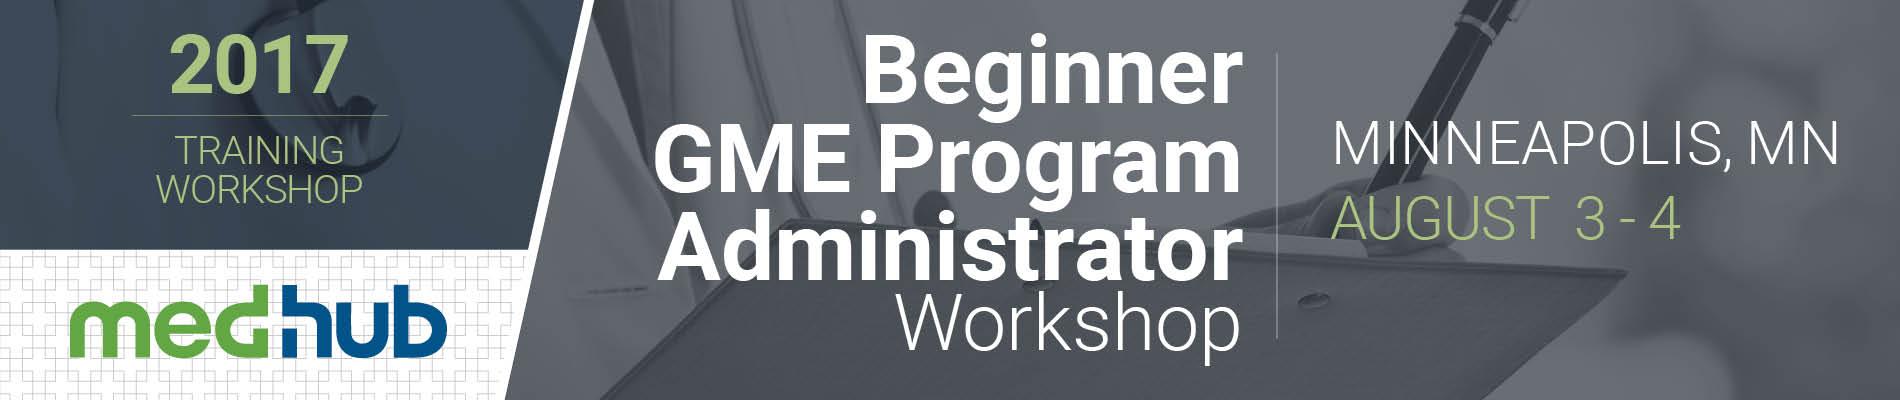 MedHub New GME Program Coordinator Workshop (Aug 3-4)